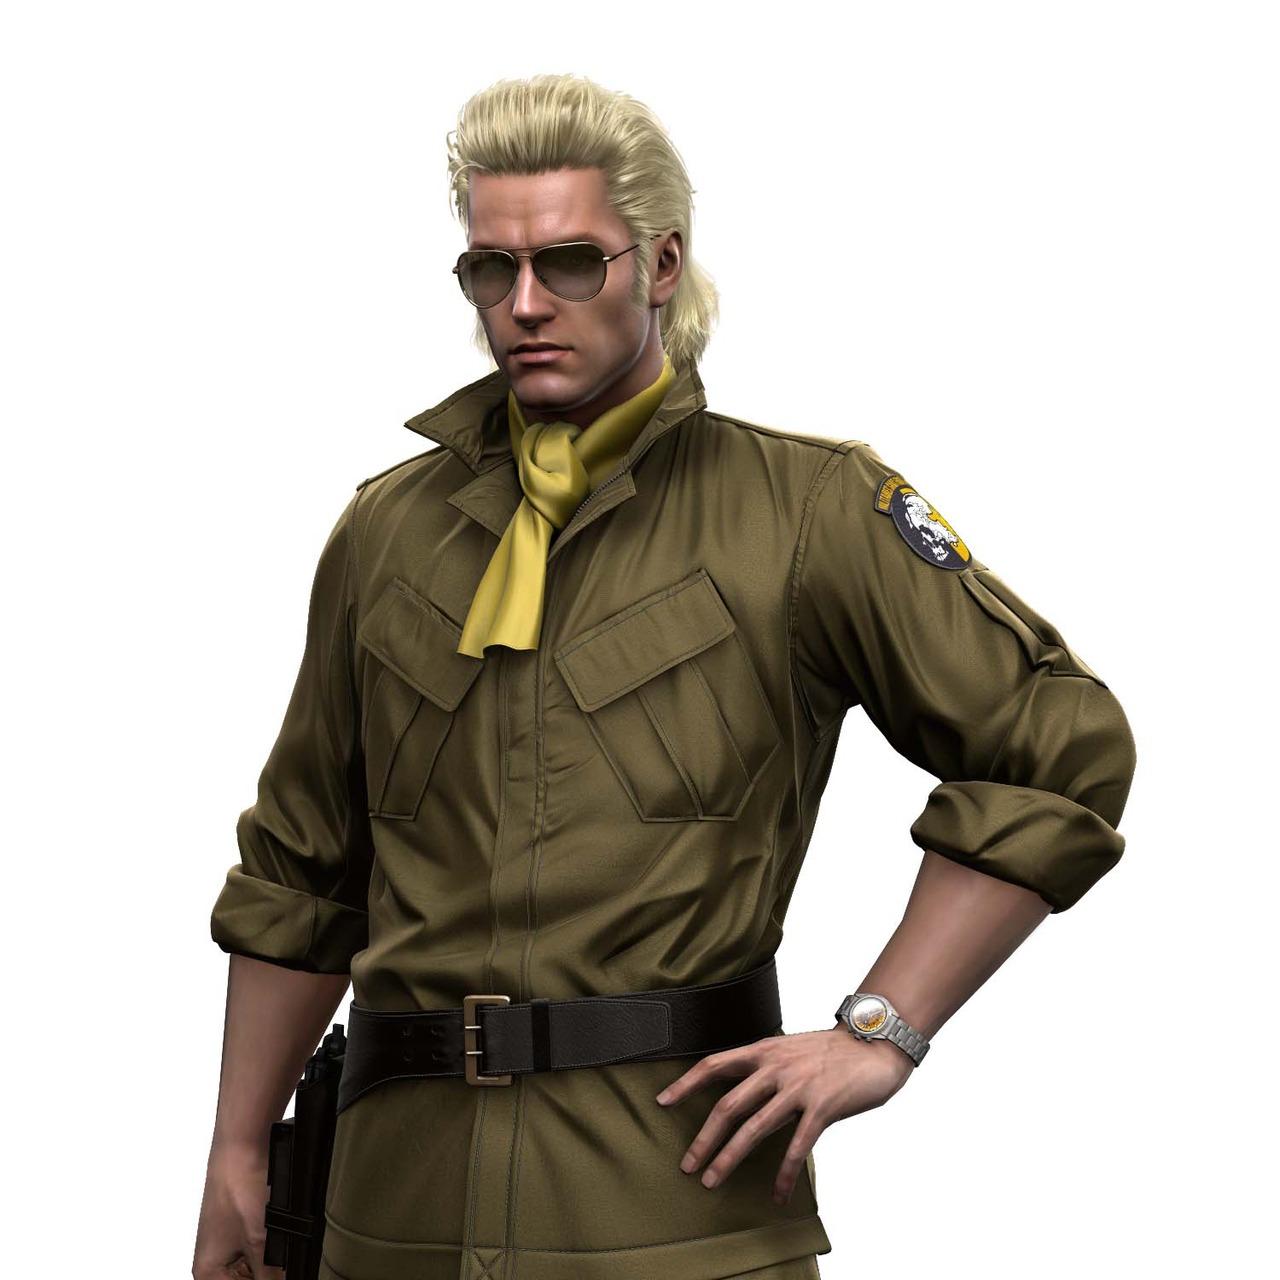 [Test] Metal Gear Solid Peace Walker - 2010 - PSP Metal-gear-solid-peace-walker-playstation-portable-psp-088